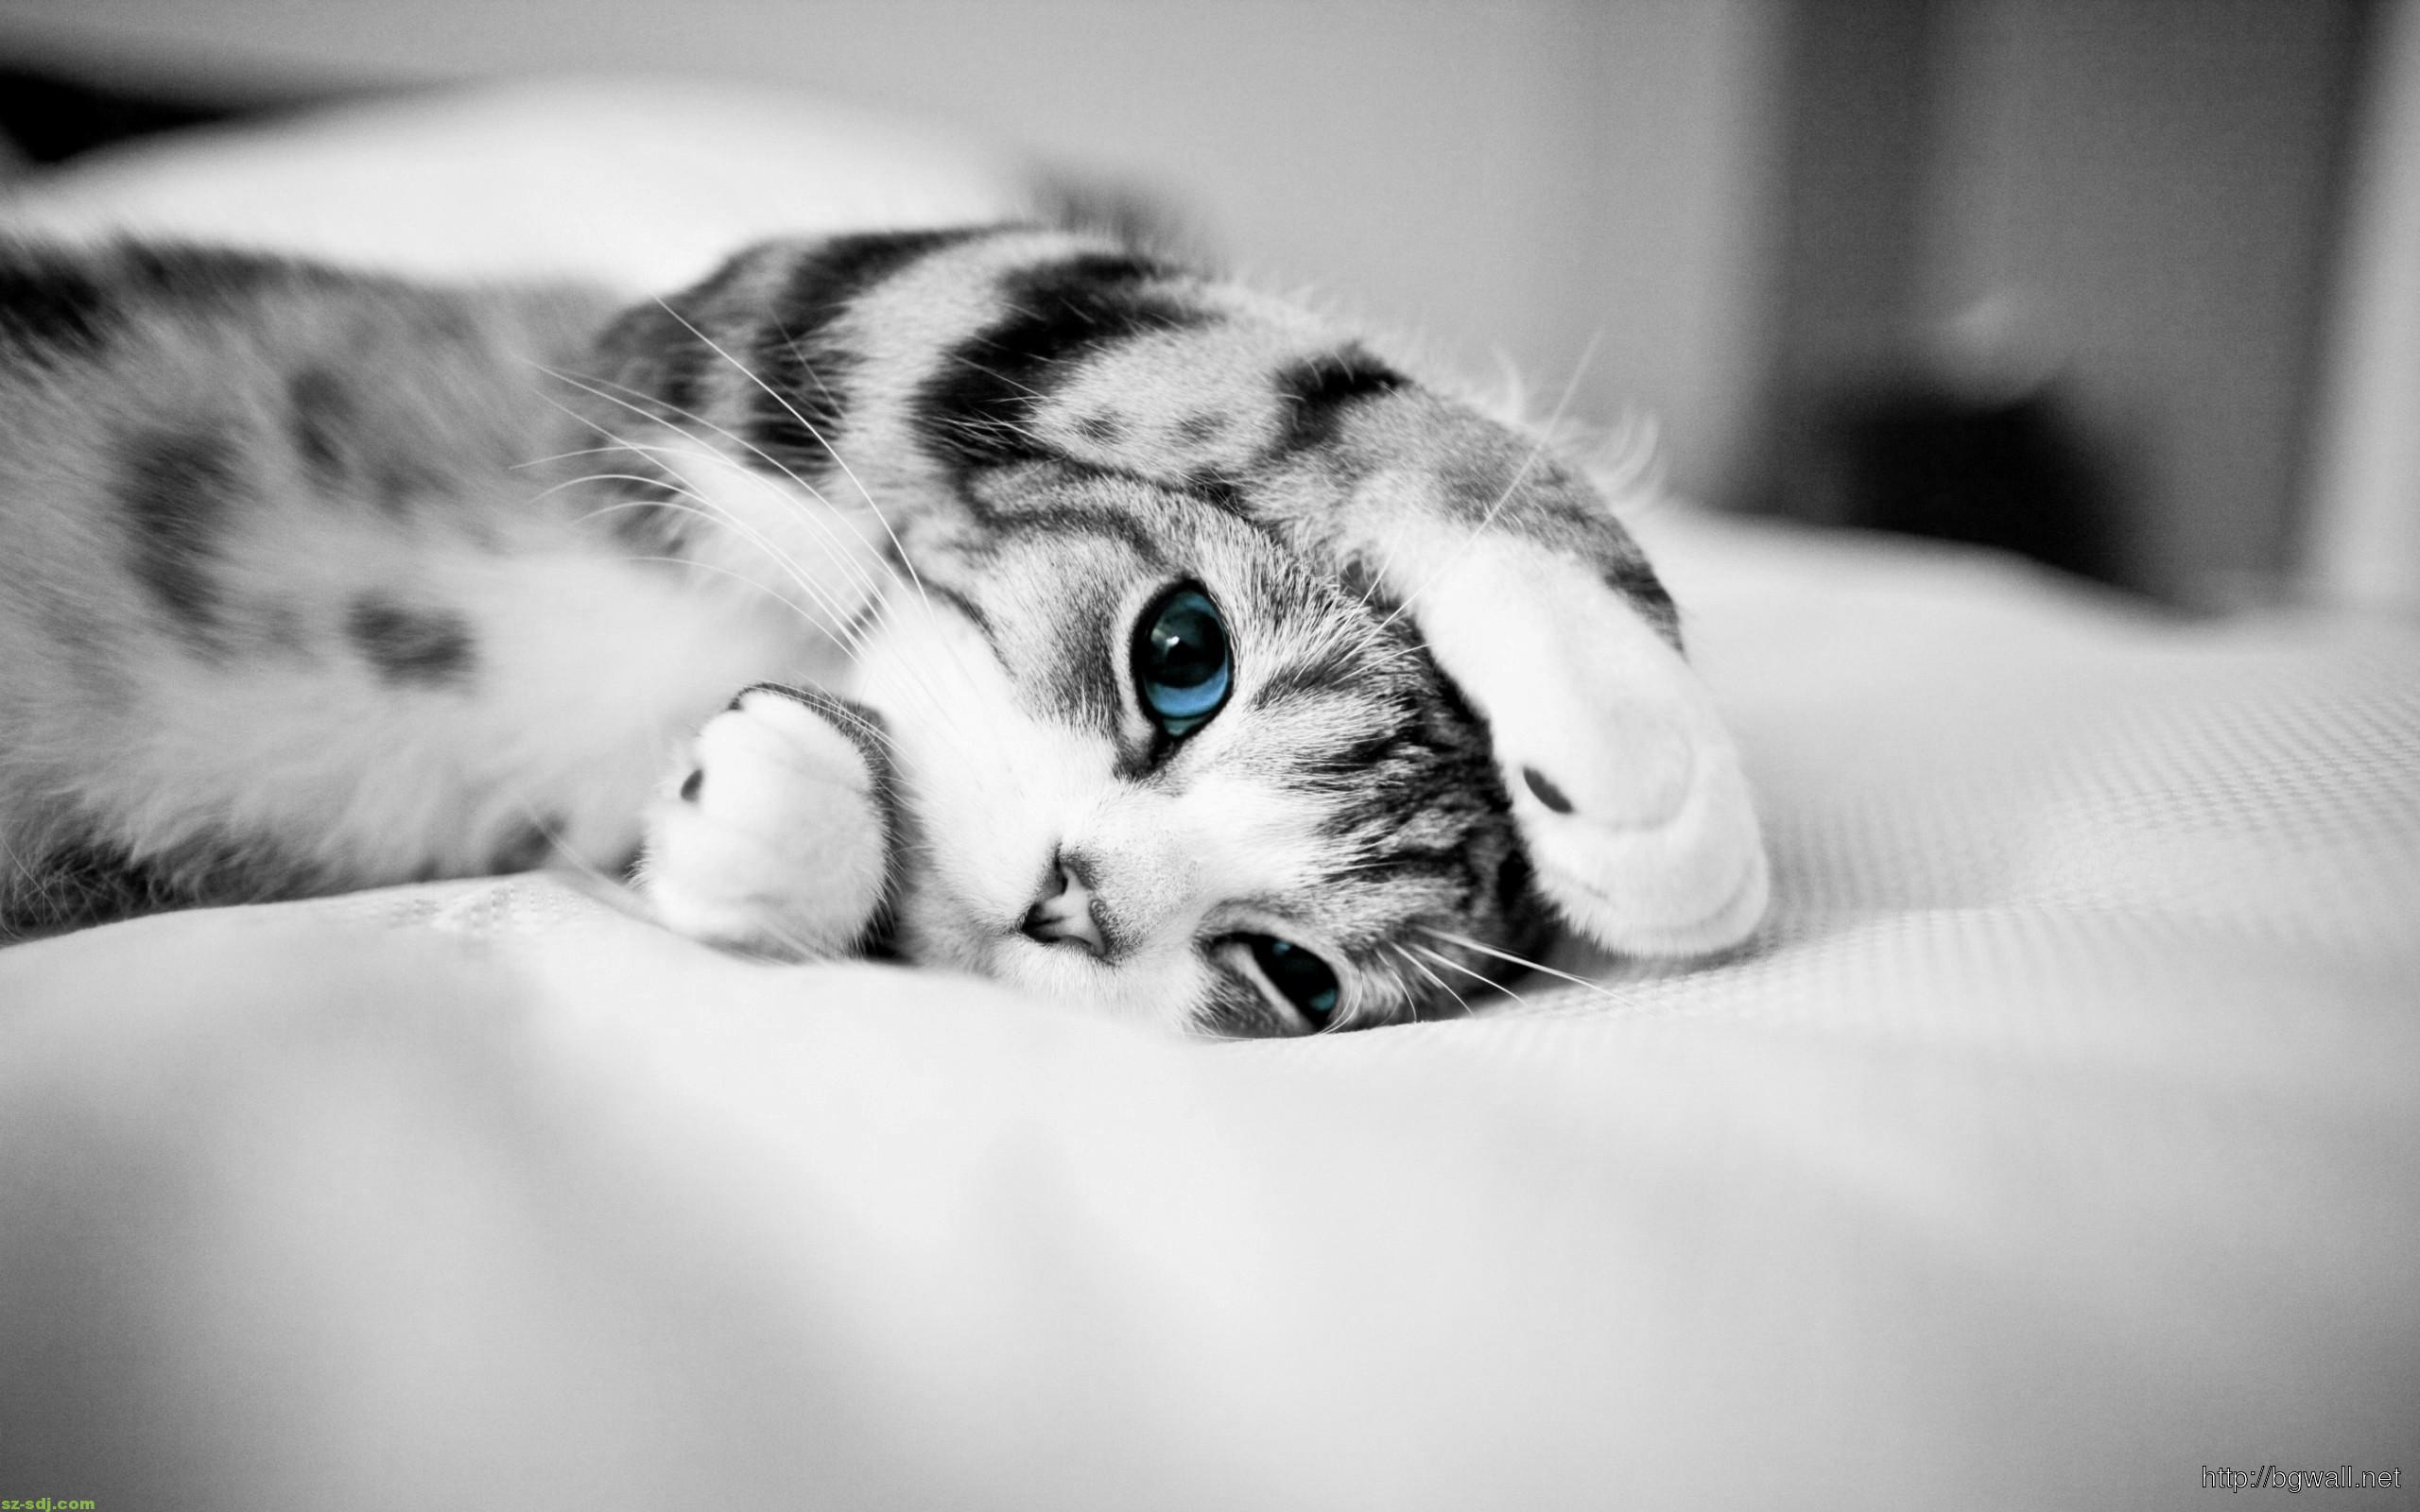 Cat Blue Eyes Cute Animal Wallpaper Hd – Background